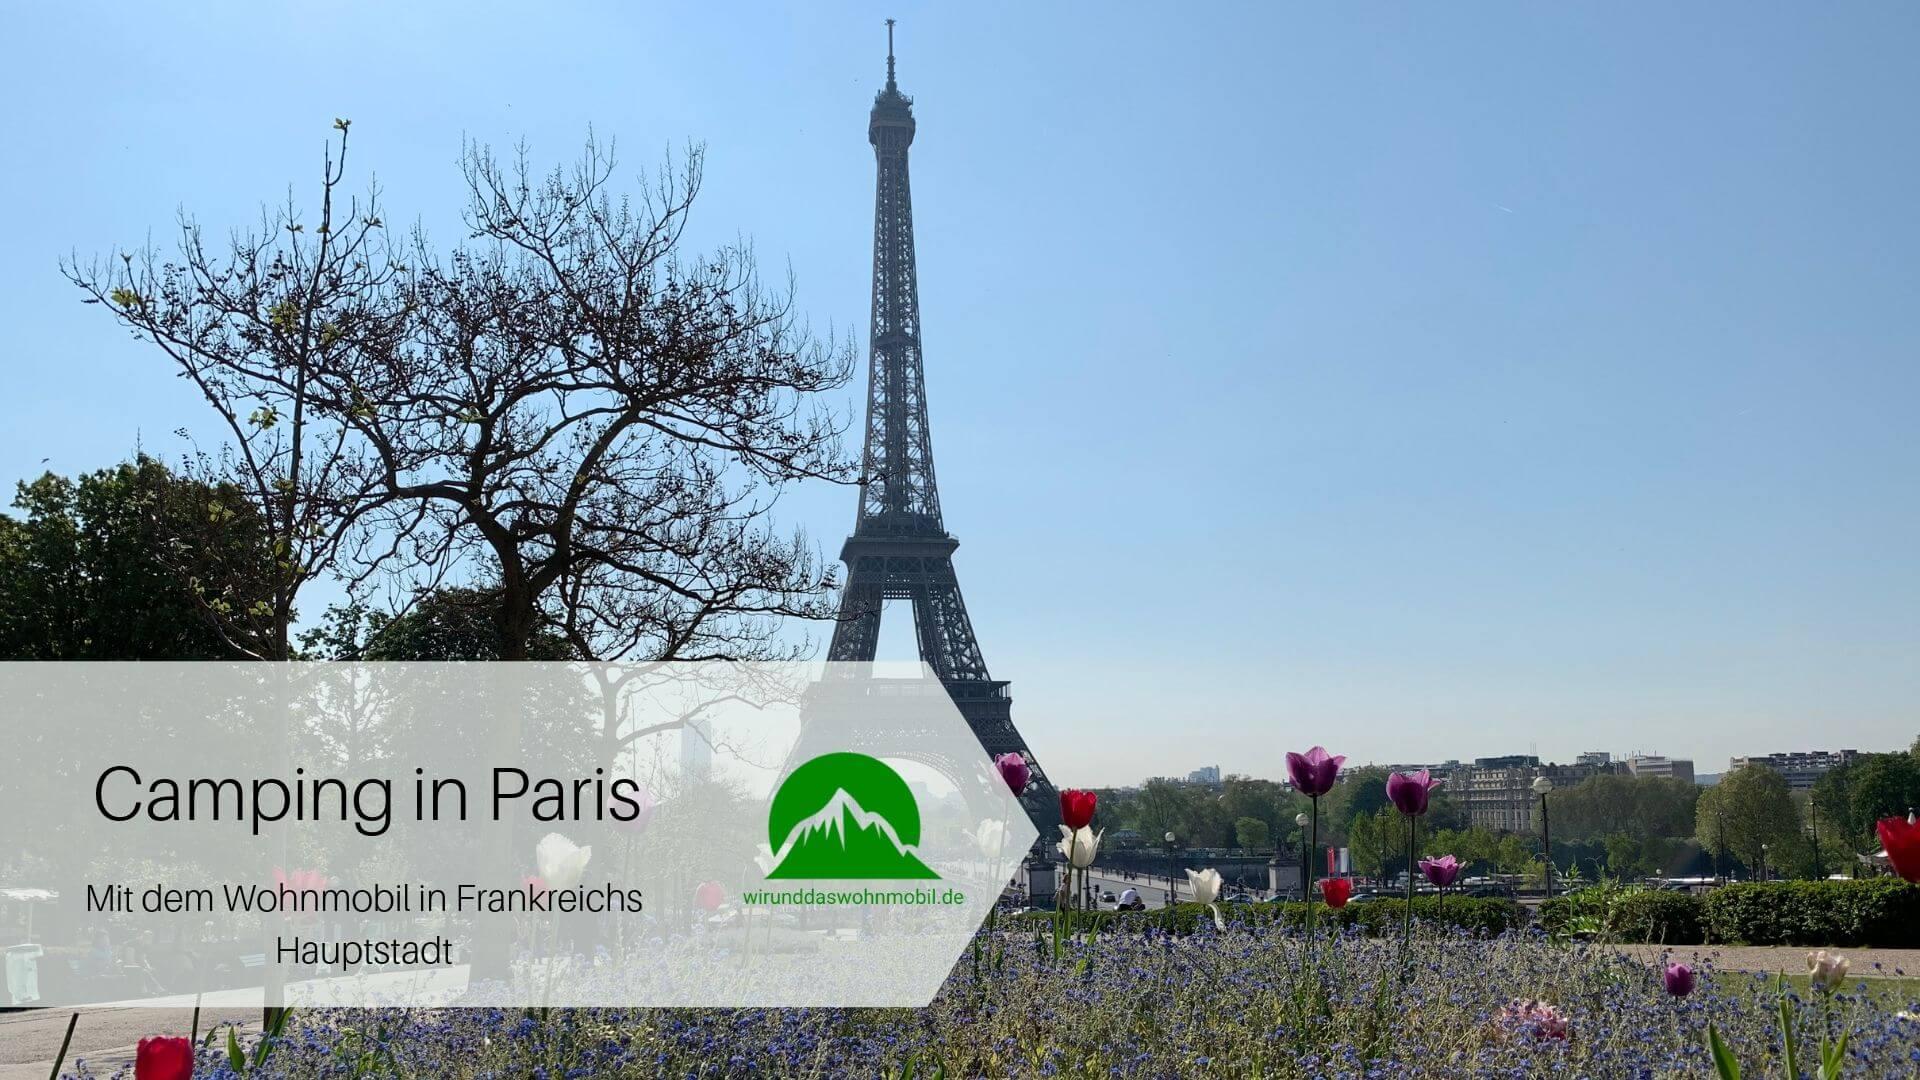 Titelbild Camping in Paris Eiffelturm